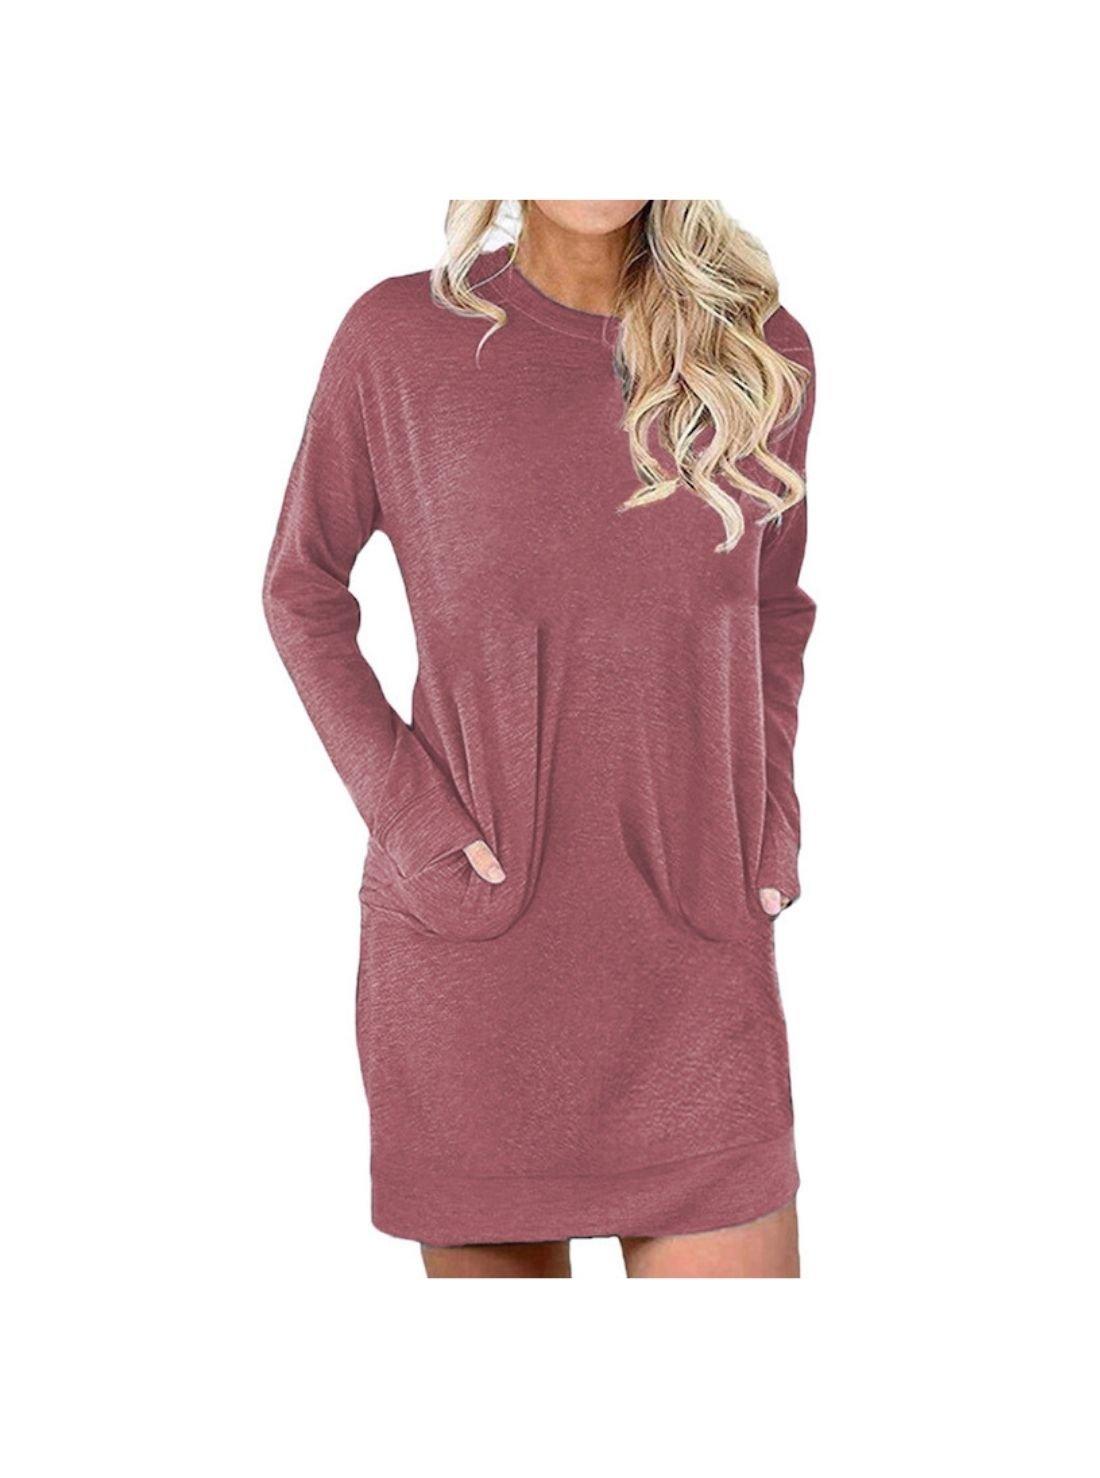 Wholesale Sweater Linen Solid Color Winter Dresses